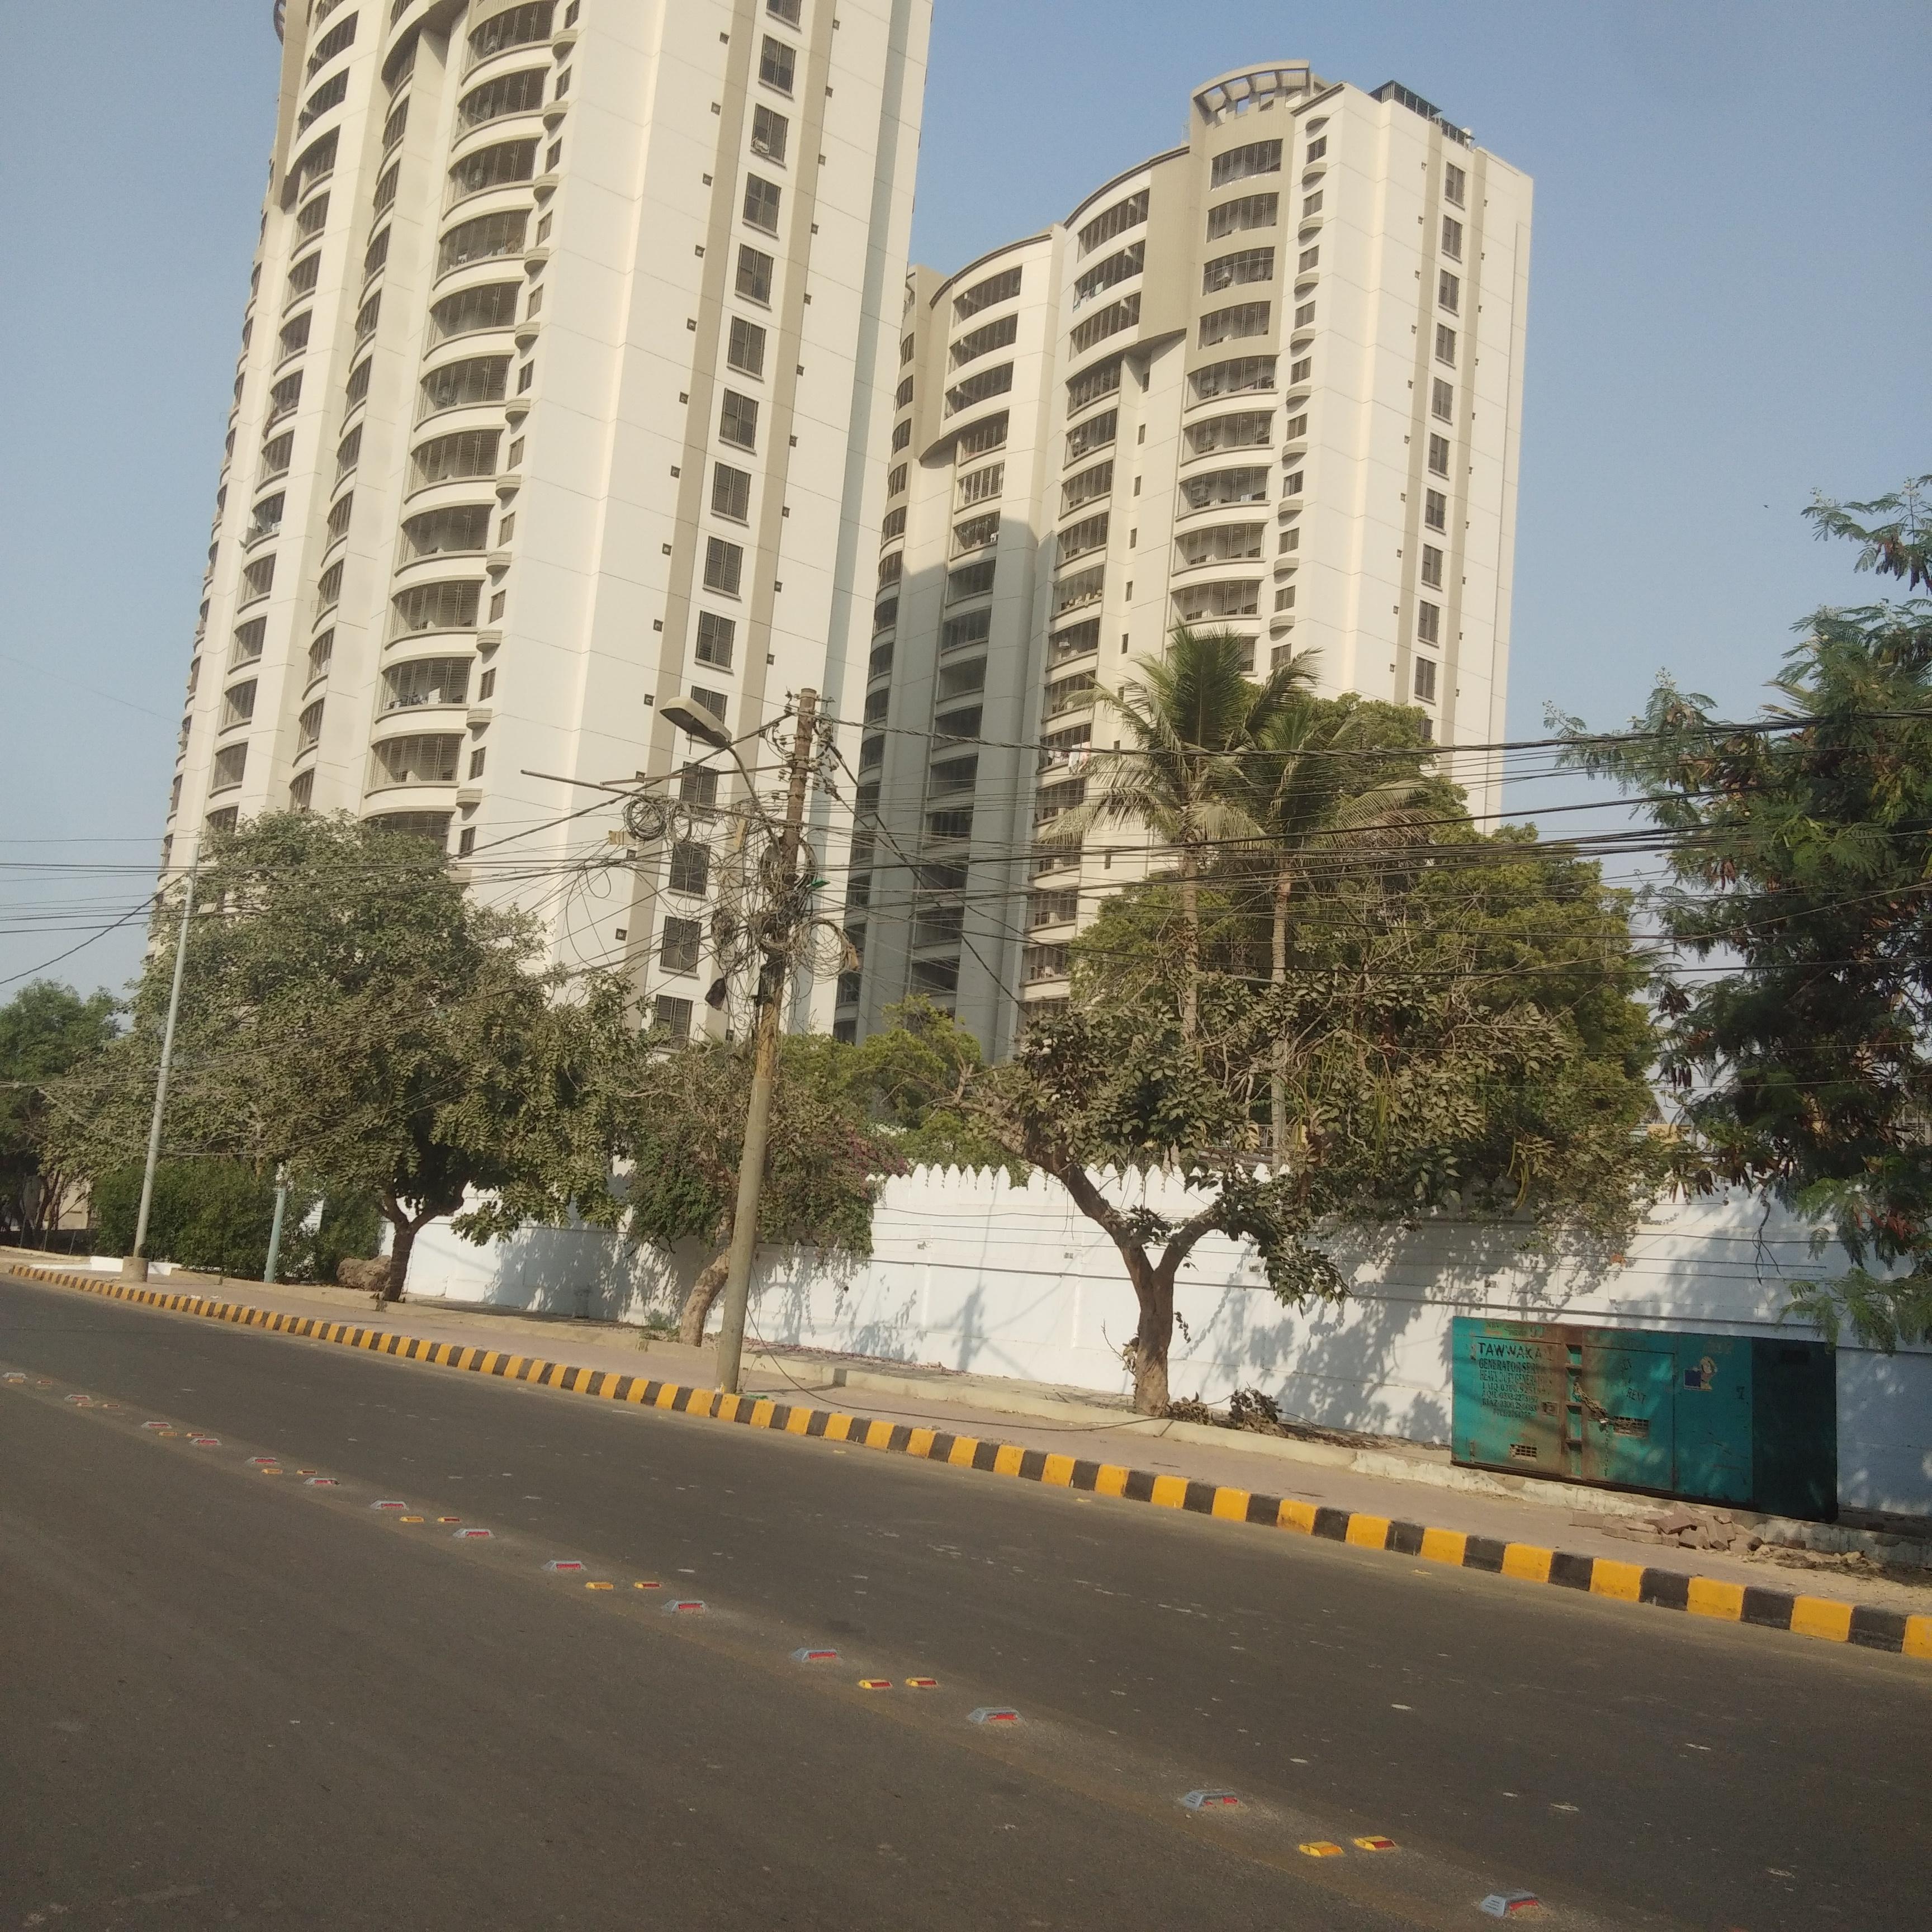 Zamzam Tower Buy Sell Property In Karachi Property Dealer In Karachi Clifton Clifton Property Dealer In Karachi Defence Clifton Property Dealer In Karachi